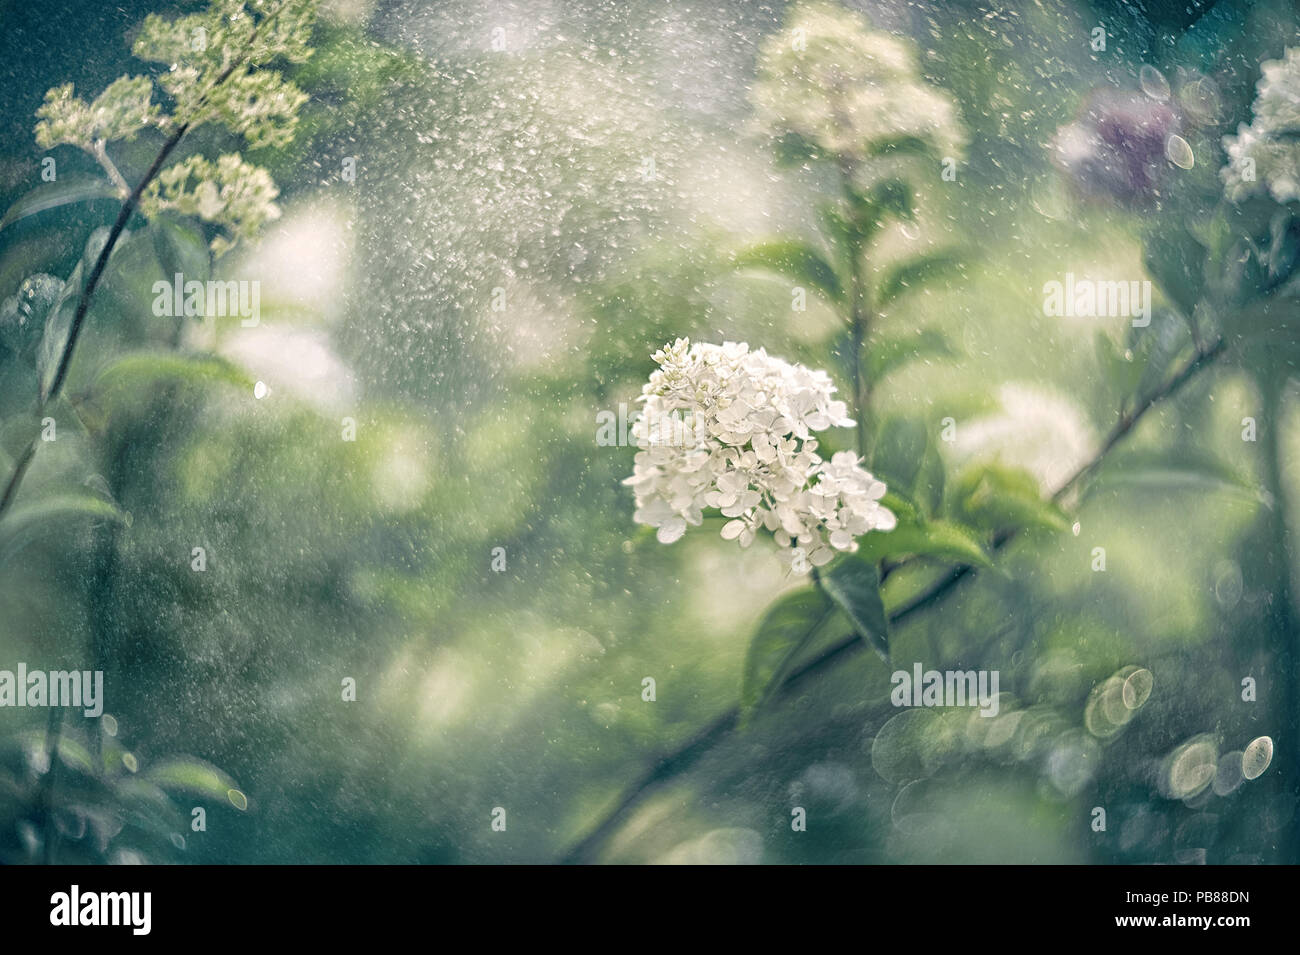 Small White Hydrangea Flowers On A Beautiful Artistic